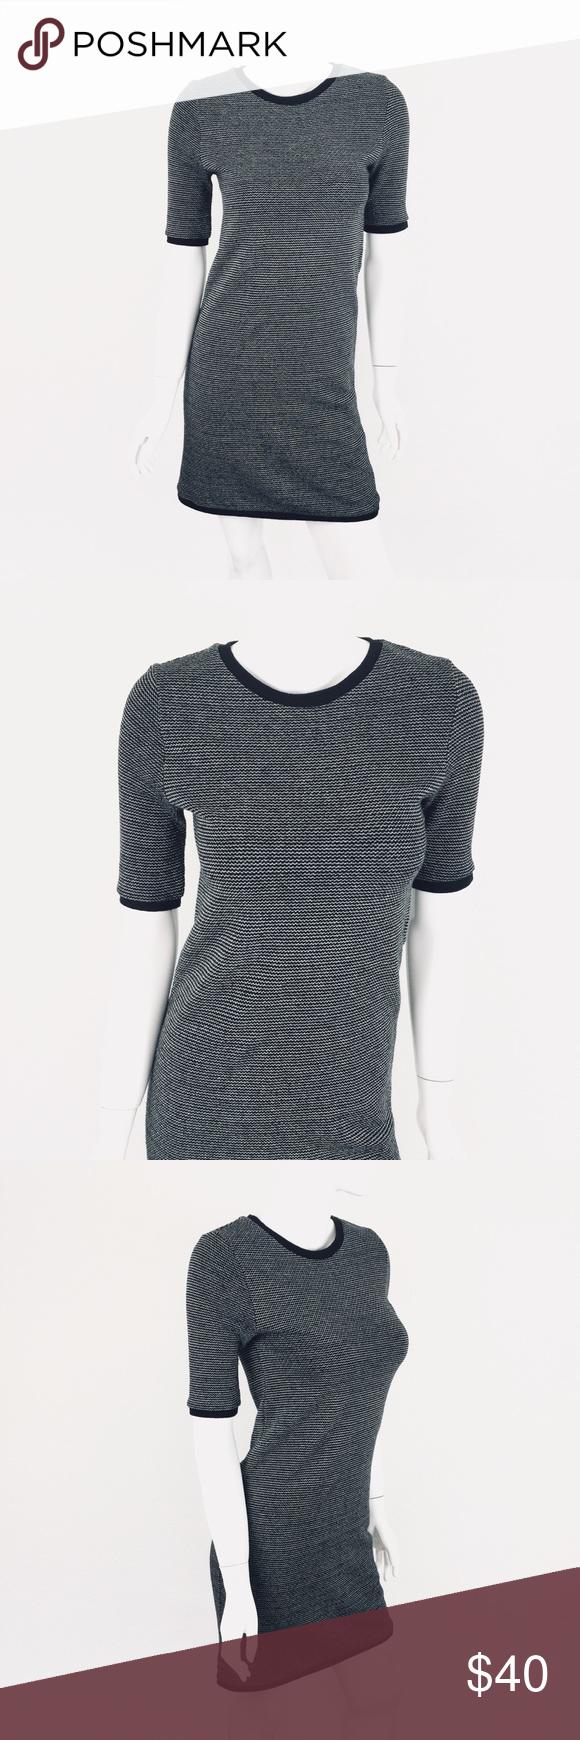 Zara Trafaluc Knit Dress M Medium Short Sleeve Knit Dress Dresses Clothes Design [ 1740 x 580 Pixel ]